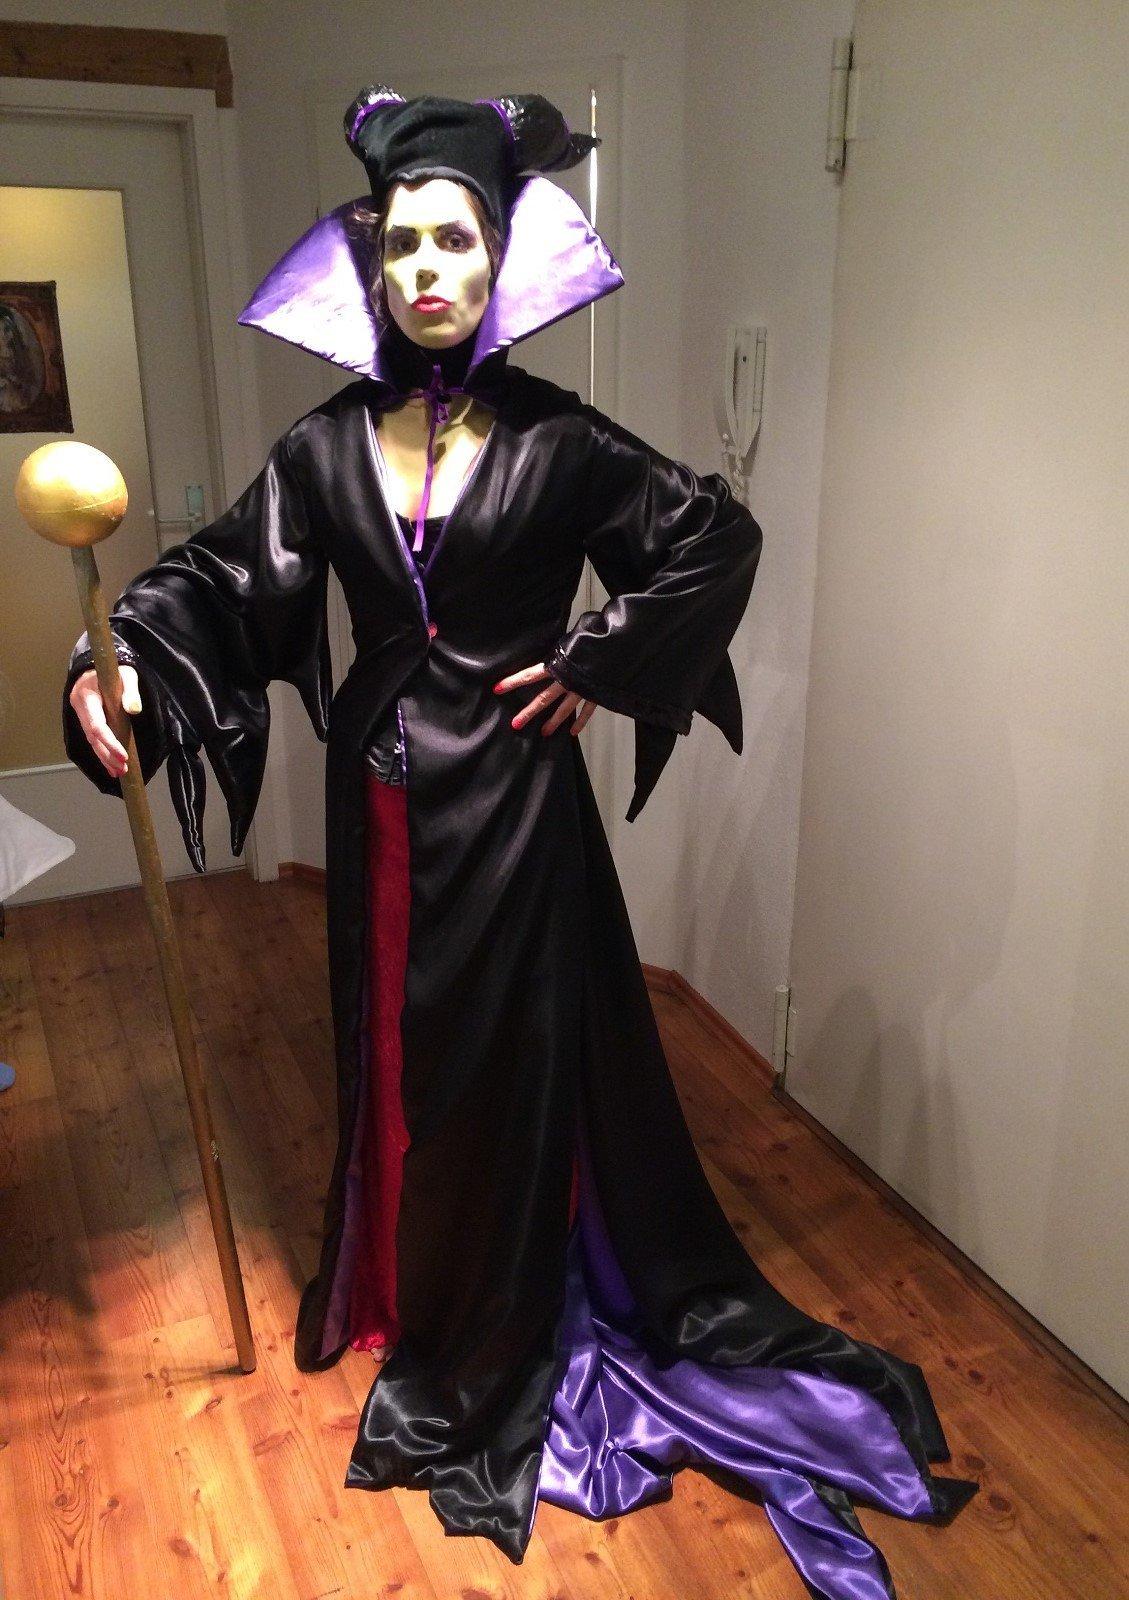 Same procedure every year - endlich Halloween » BERNINA Blog